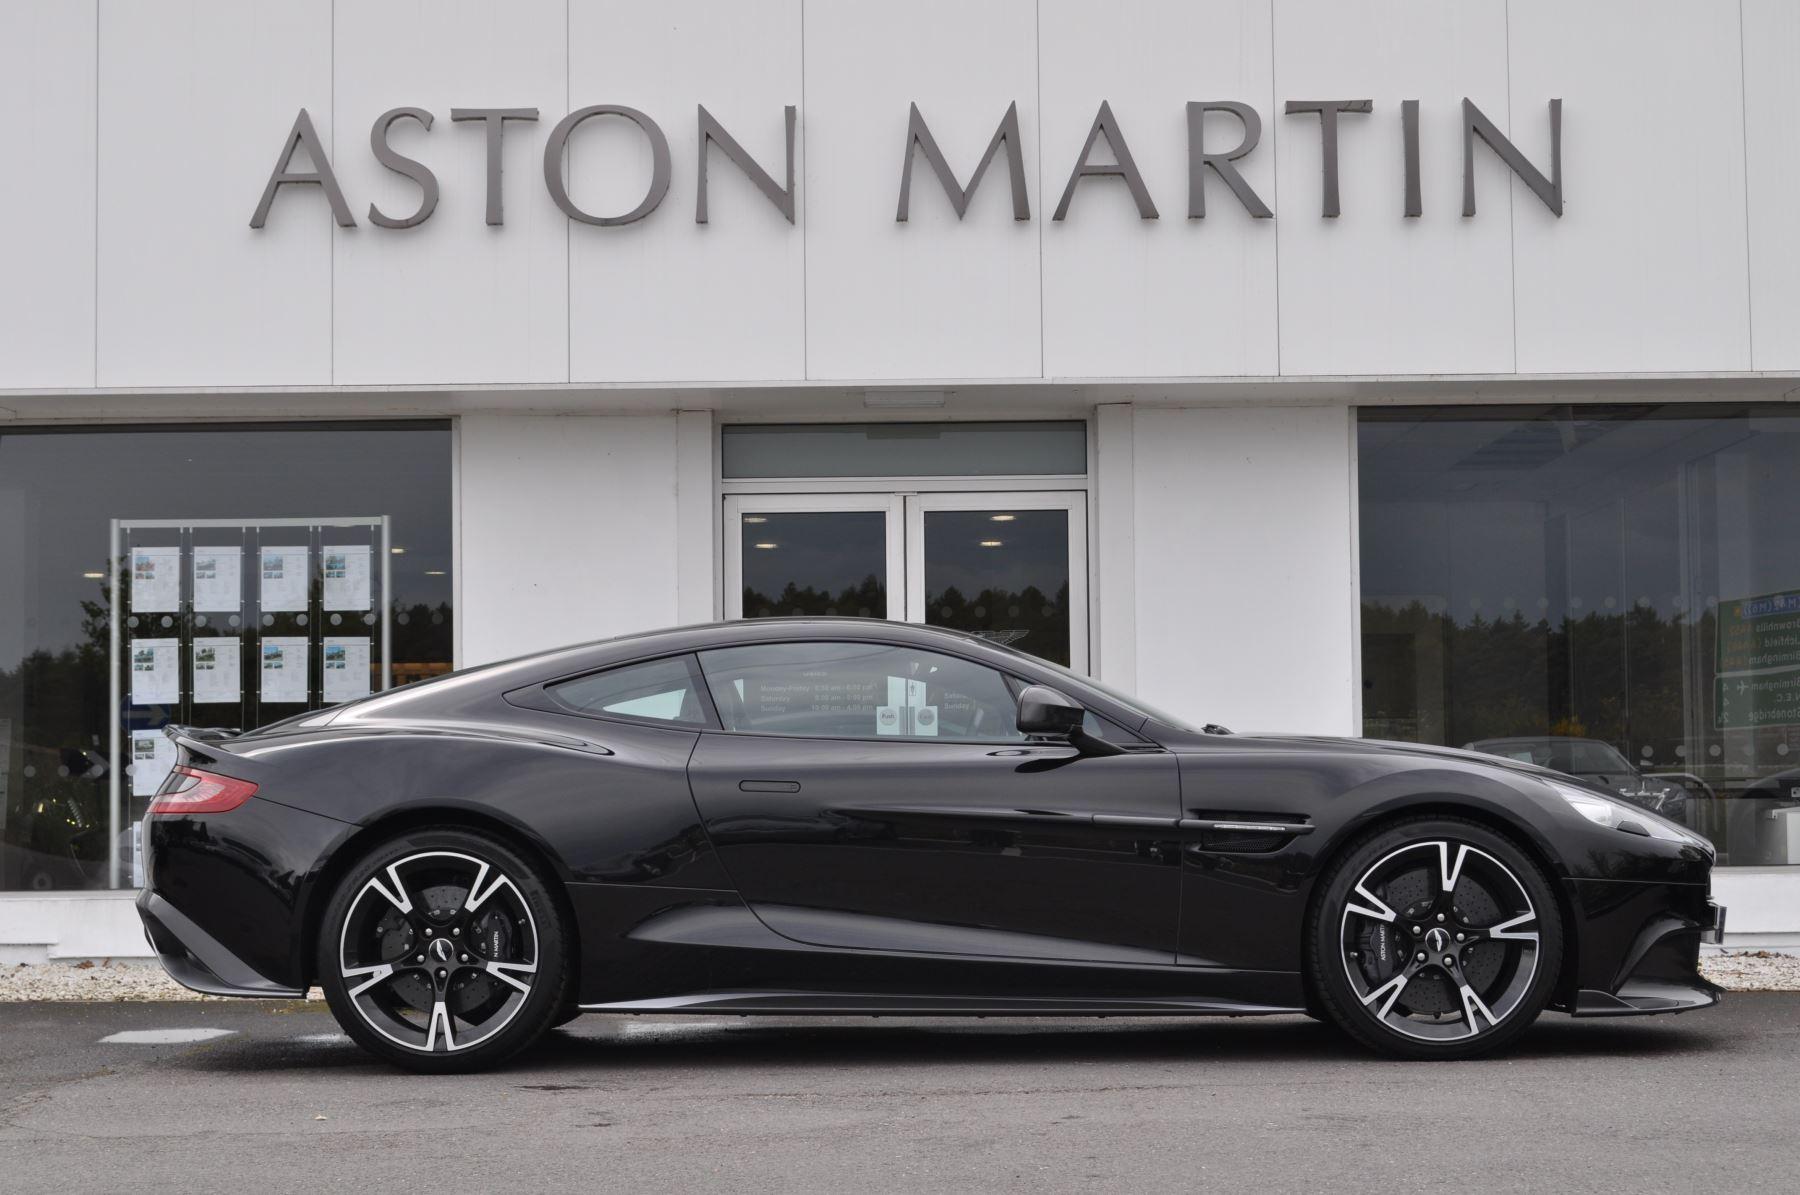 Aston Martin Vanquish V12 [595] S 2+2 2dr Touchtronic image 4